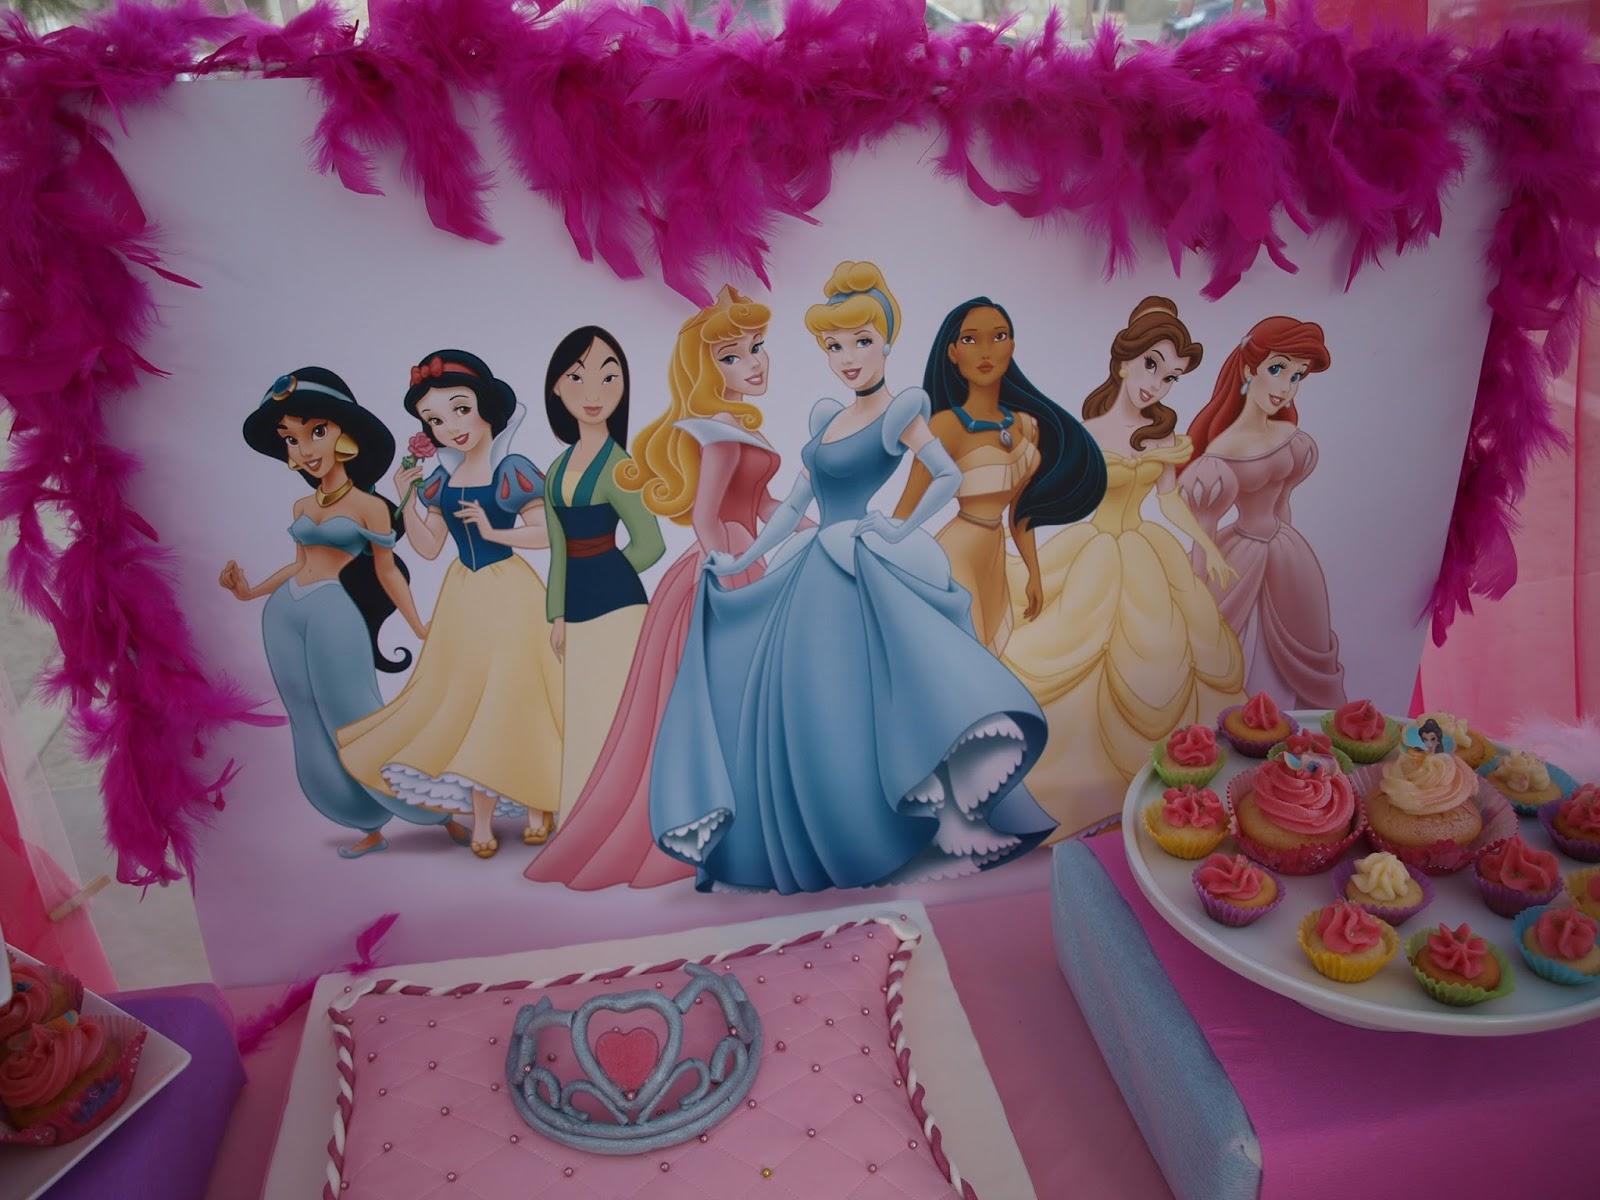 La casita de esther mesa dulce de princesas - Casitas de princesas ...